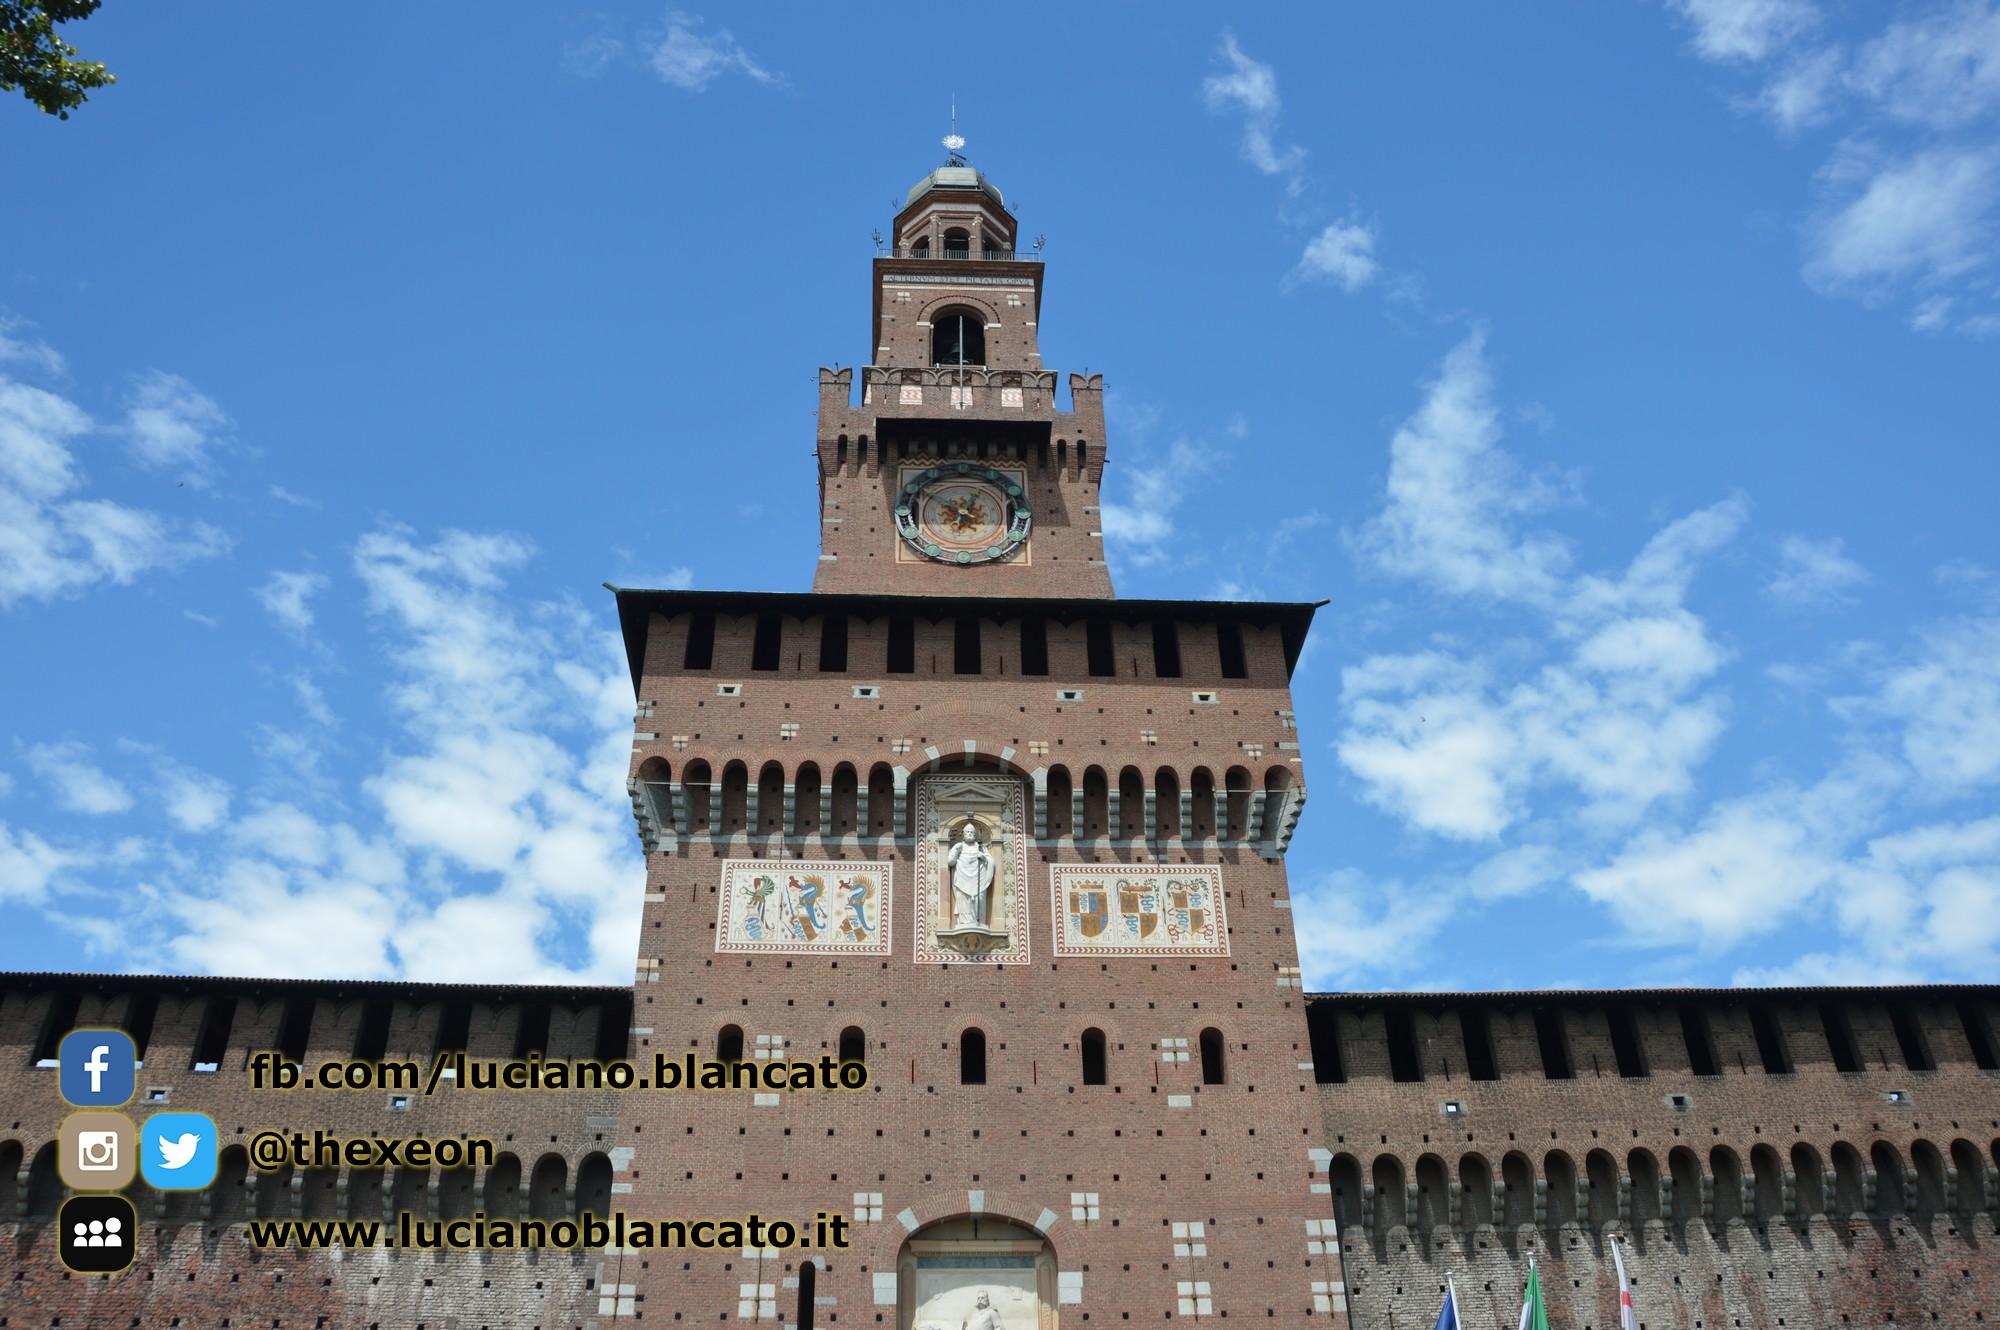 copy_3_Milano - Castello sforzesco